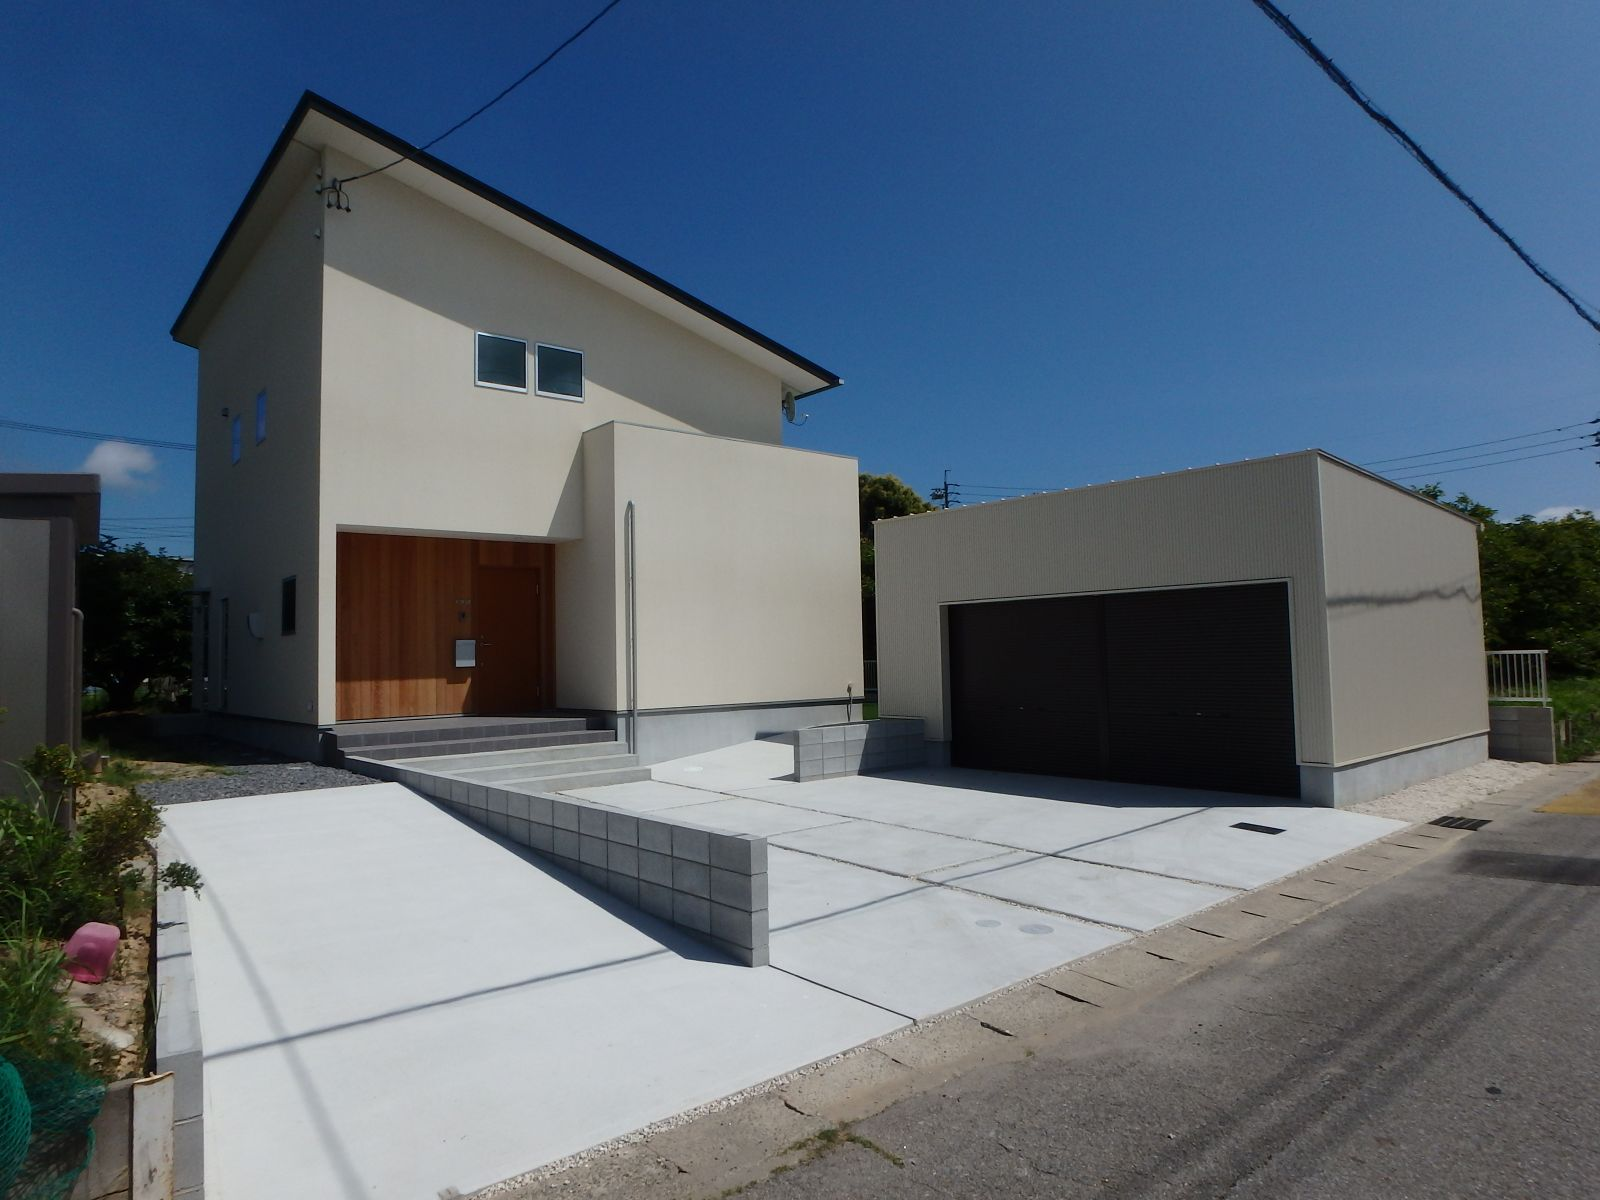 RIKYU (リキュー)【デザイン住宅、建築家、インテリア】外観と統一感のあるガレージ